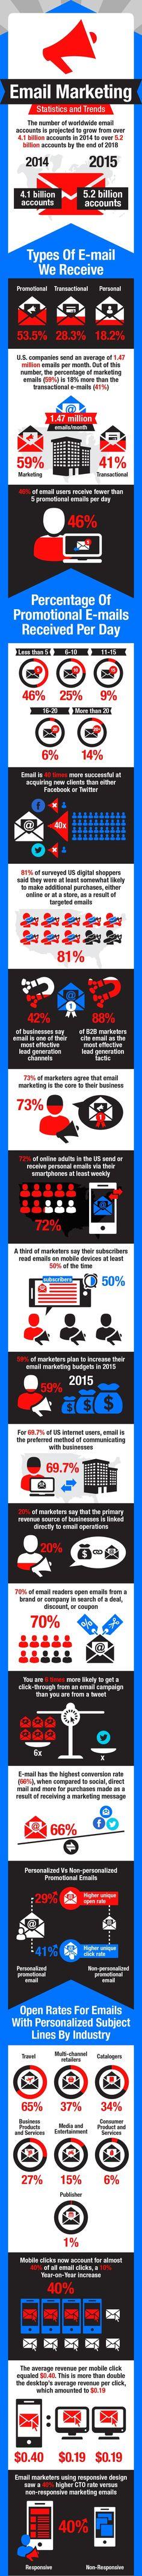 email-marketing-statistics.jpg